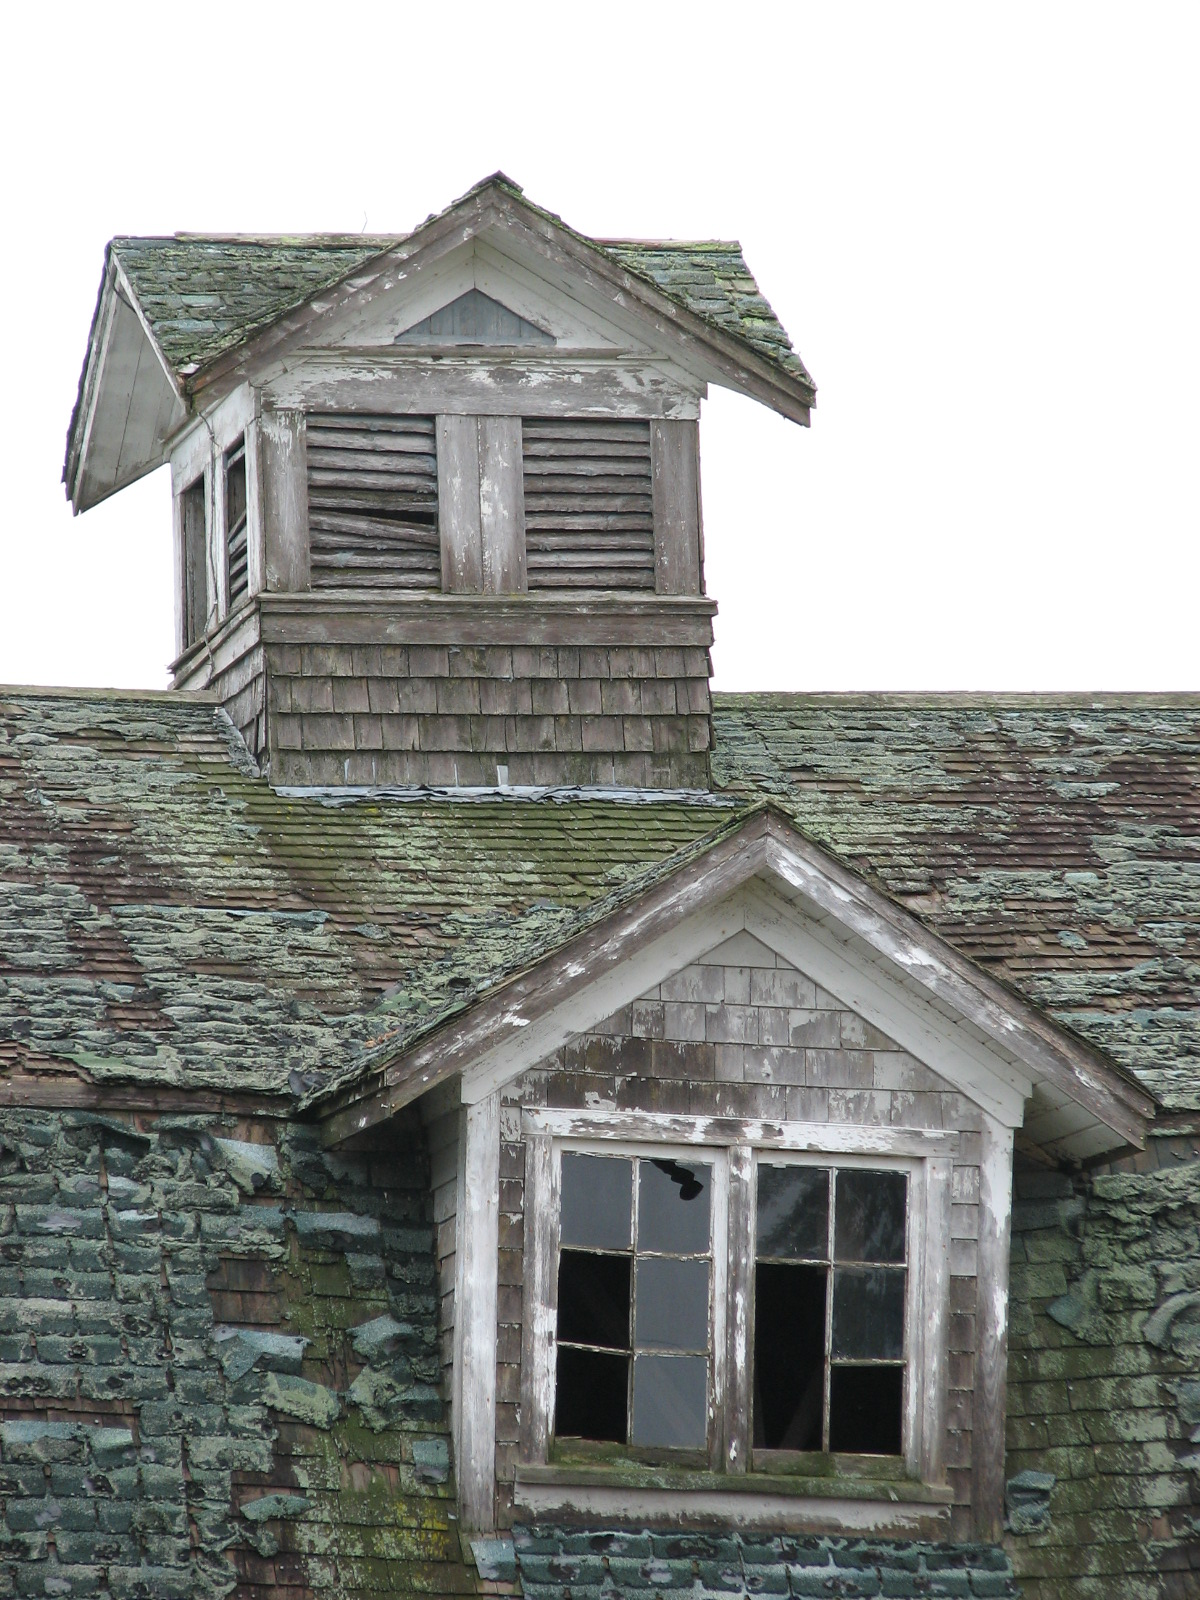 P E I Heritage Buildings April 2011